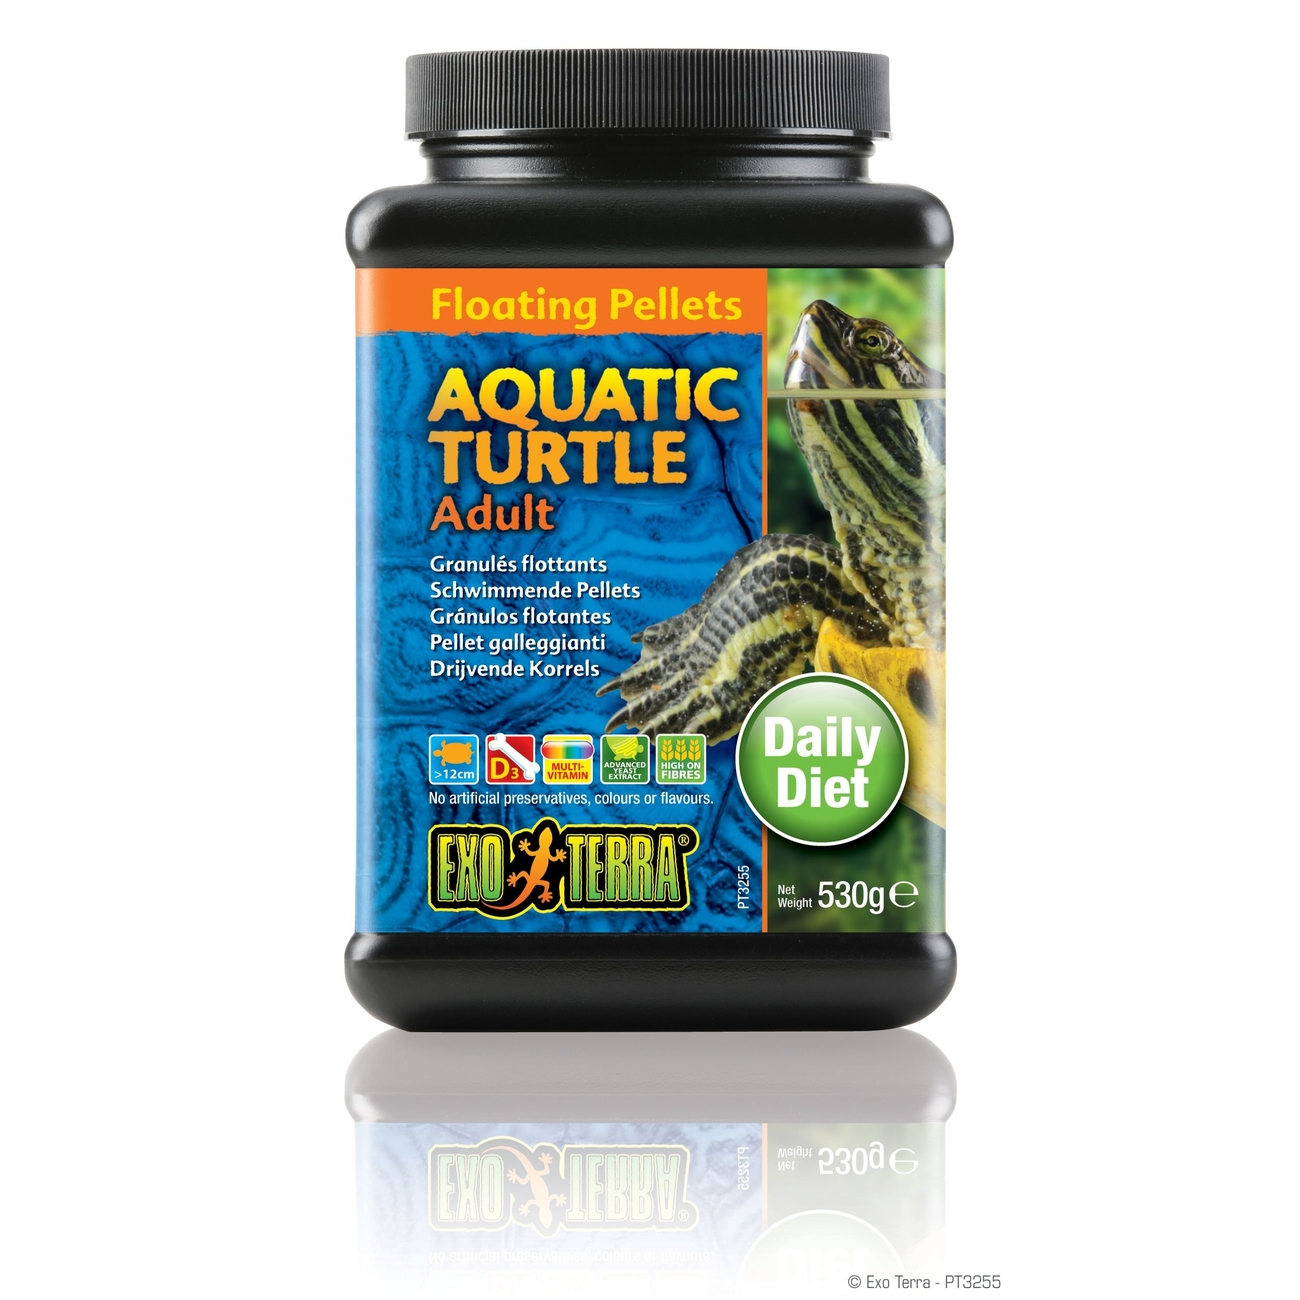 Exo Terra -  Aquatic Turtle Adult, schwimmende Futter-Pellets, Bild 4